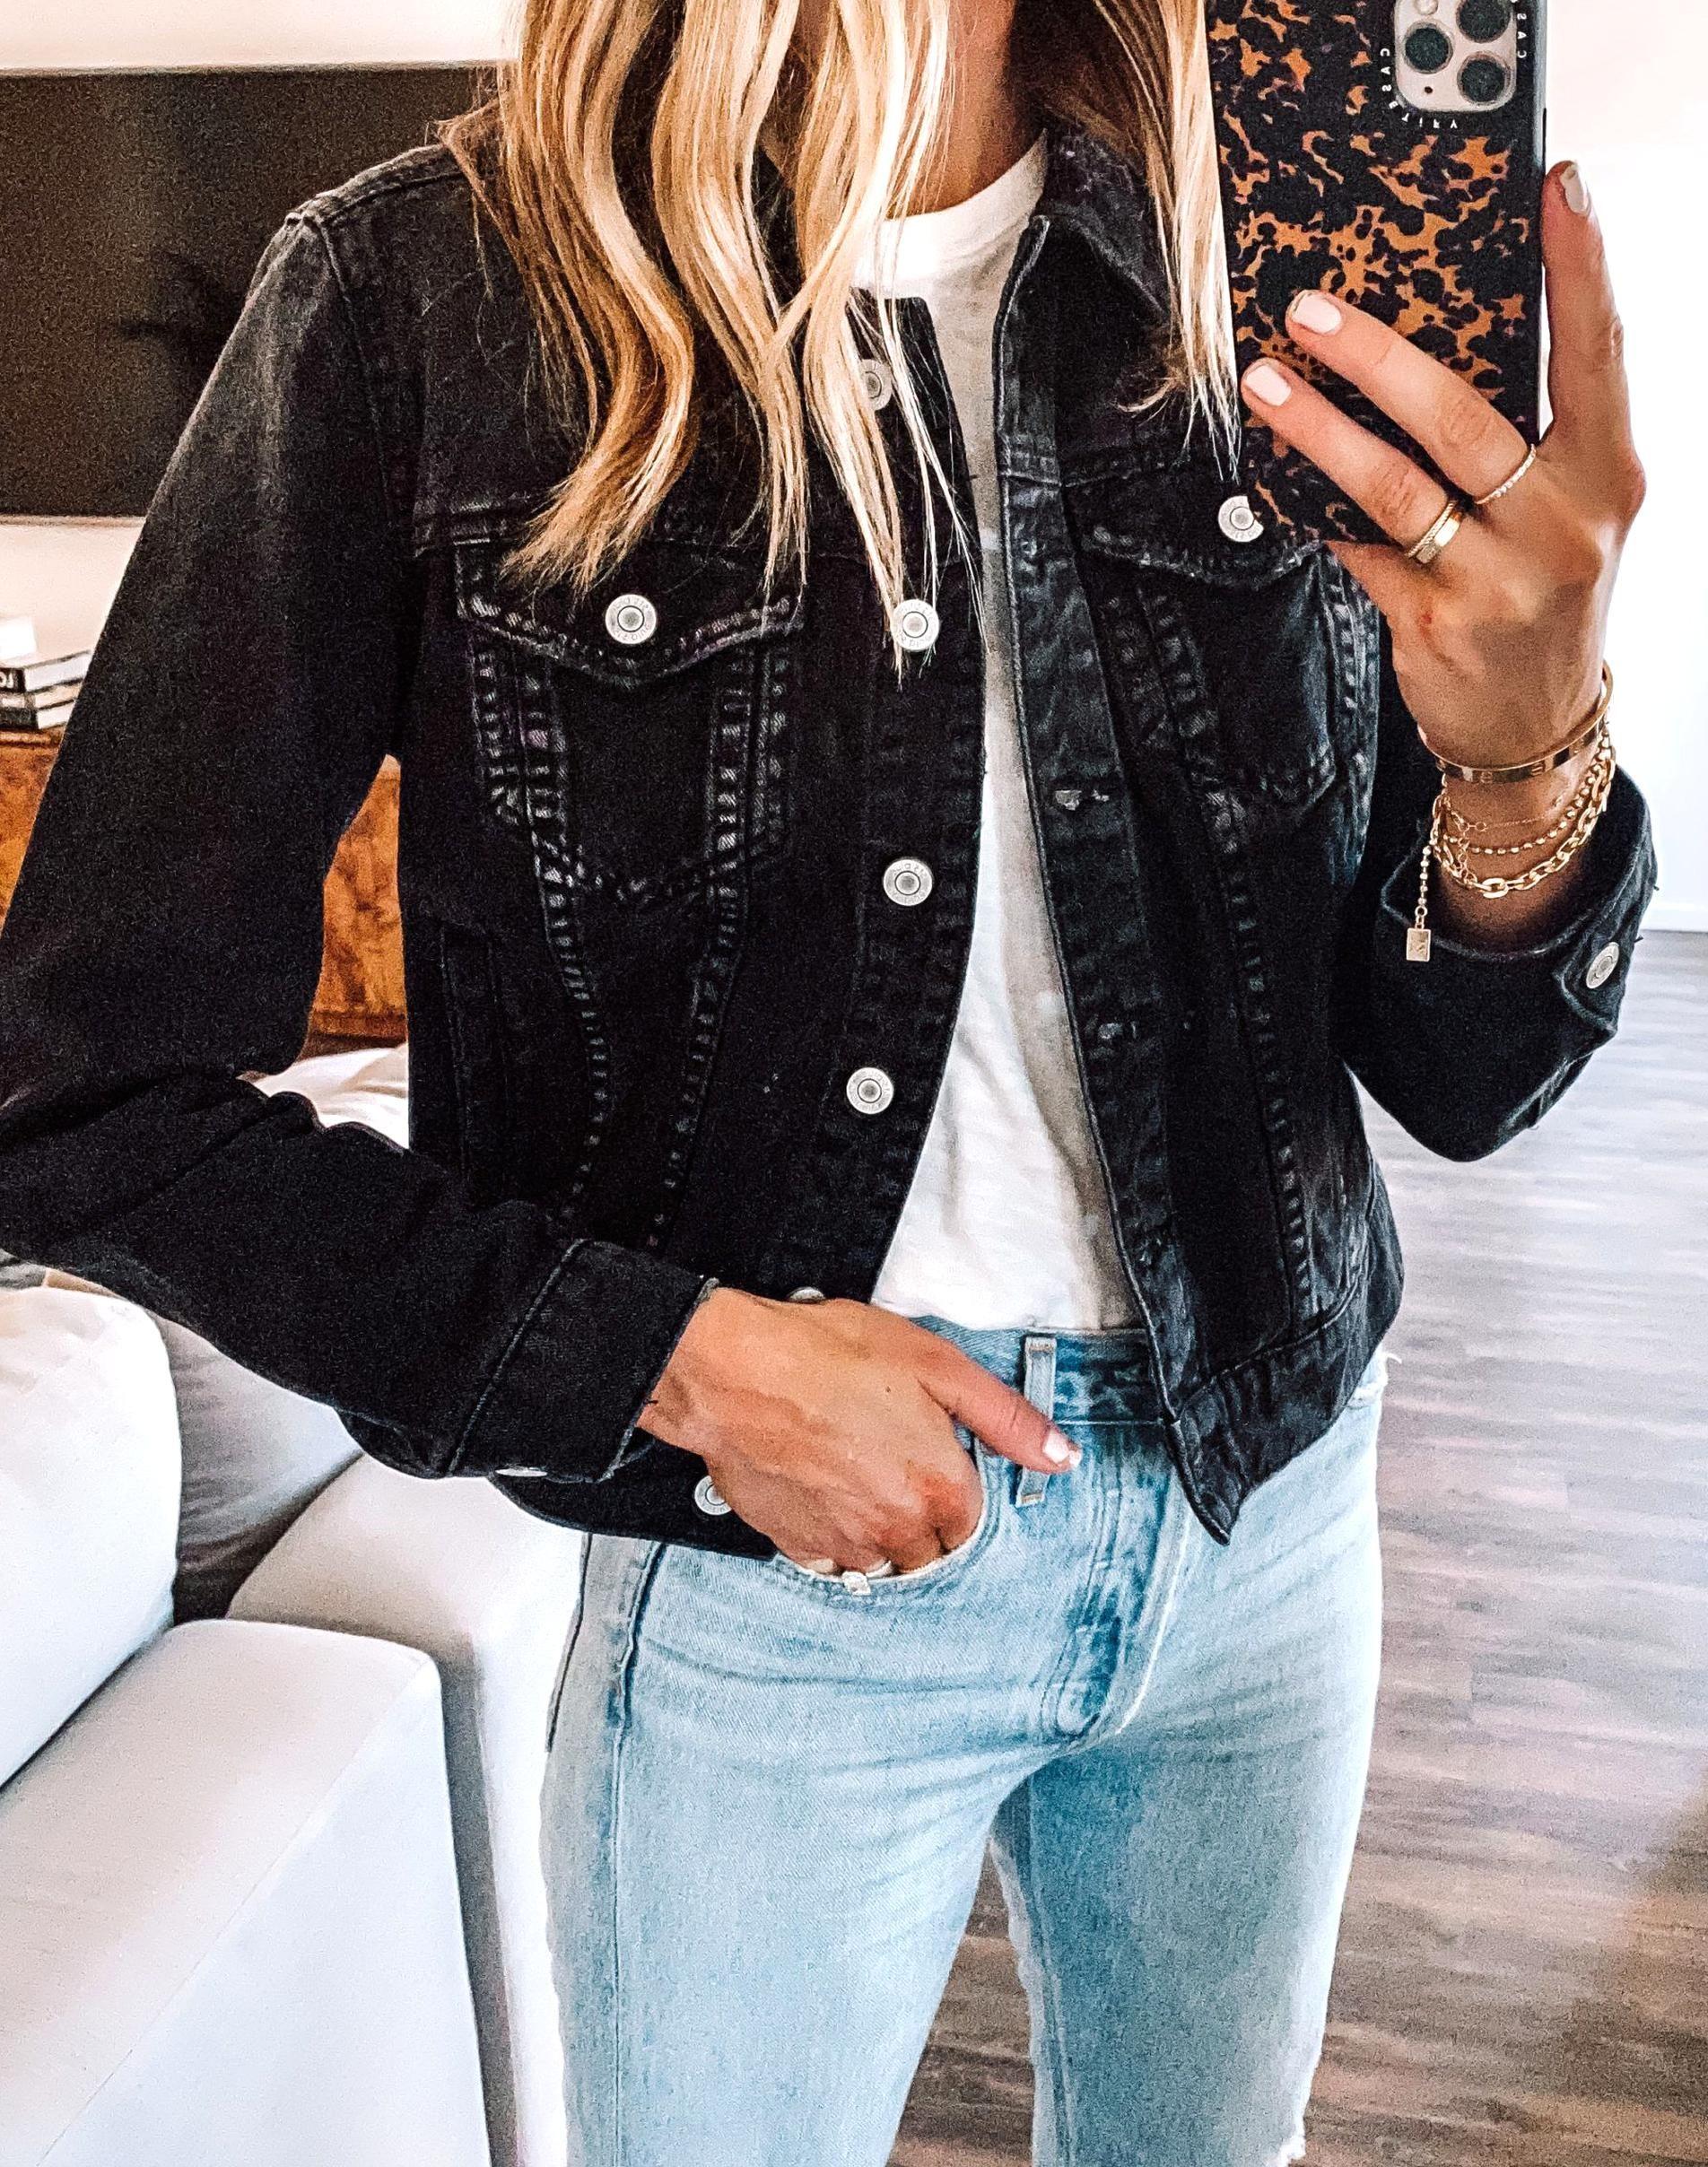 Fashion Jackson Wearing Black Denim Jacket White Tshirt Ripped Denim Jeans Jean Jacket Ou In 2020 Denim Jacket Outfit Fall Denim Jacket Outfit Black Denim Jeans Outfit [ 2416 x 1904 Pixel ]